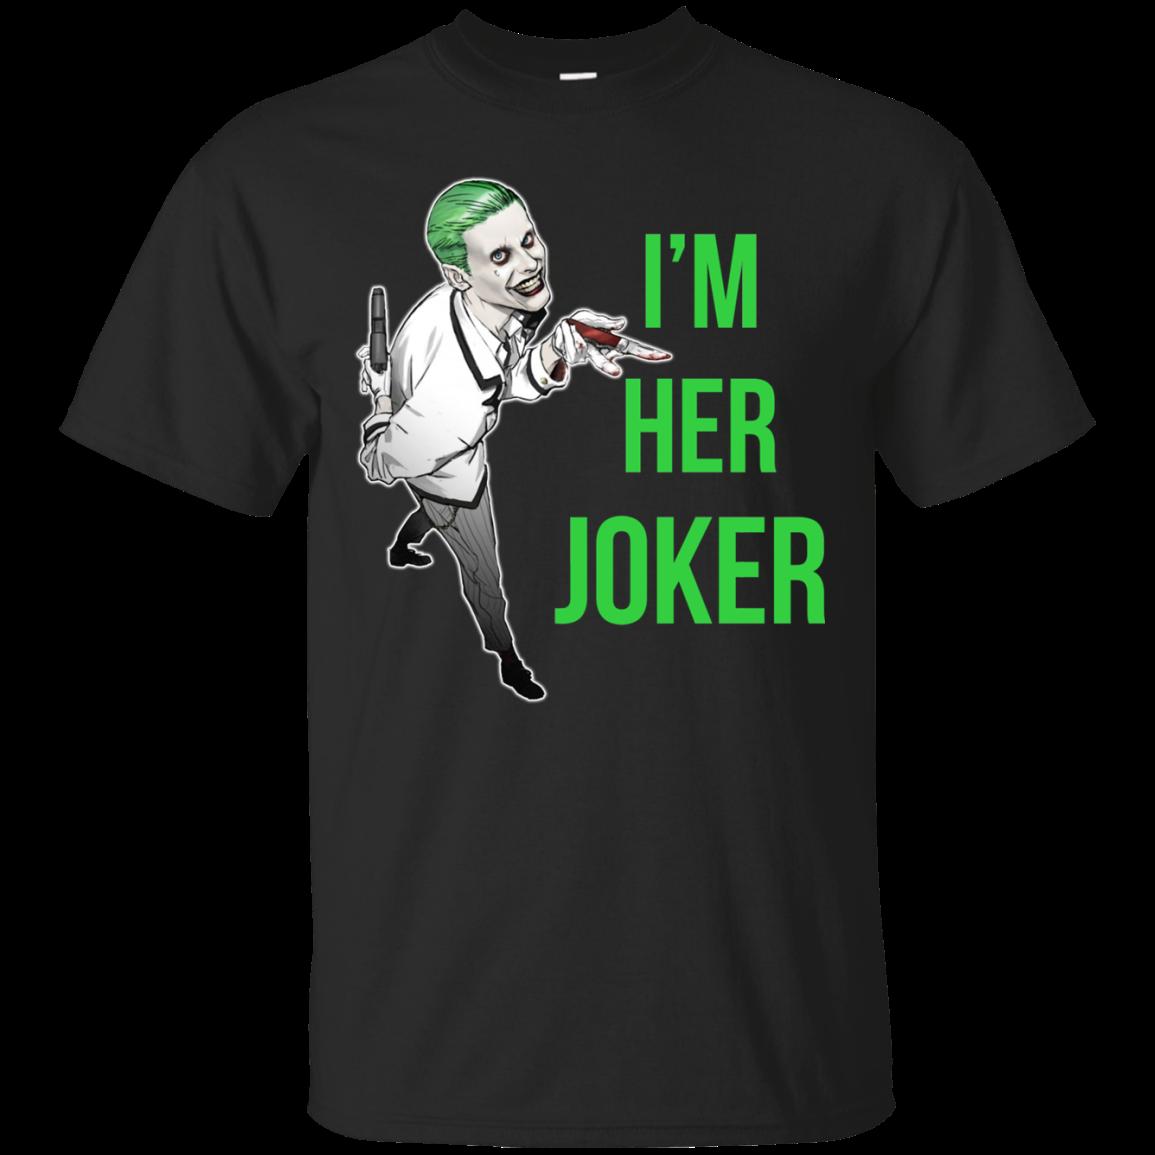 8c626026 Her Joker - His Harley Quinn t shirt, long sleeve, hoodie -  RobinPlaceFabrics